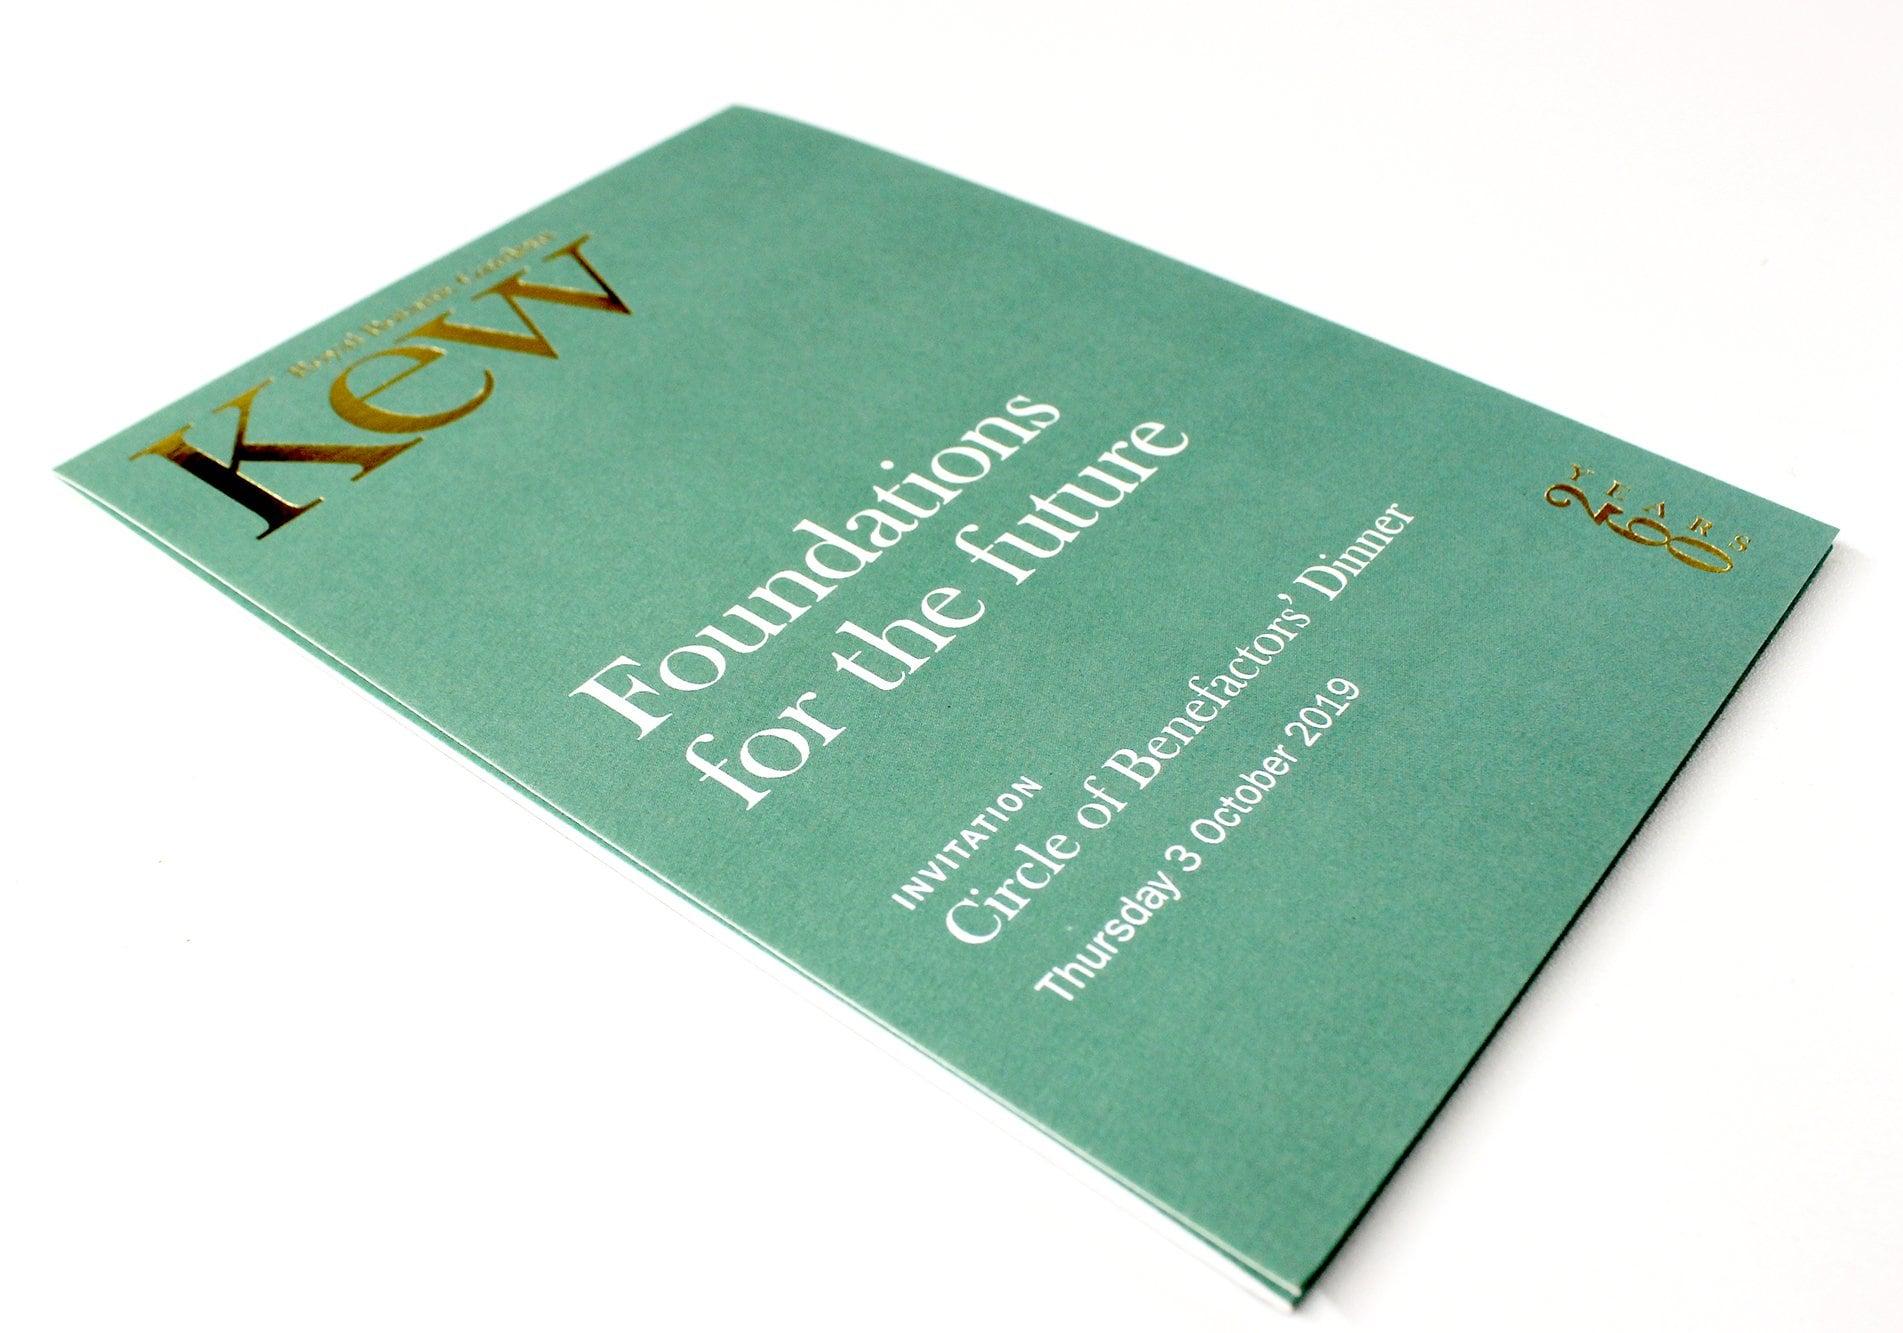 Kew Foundations for the future invitation